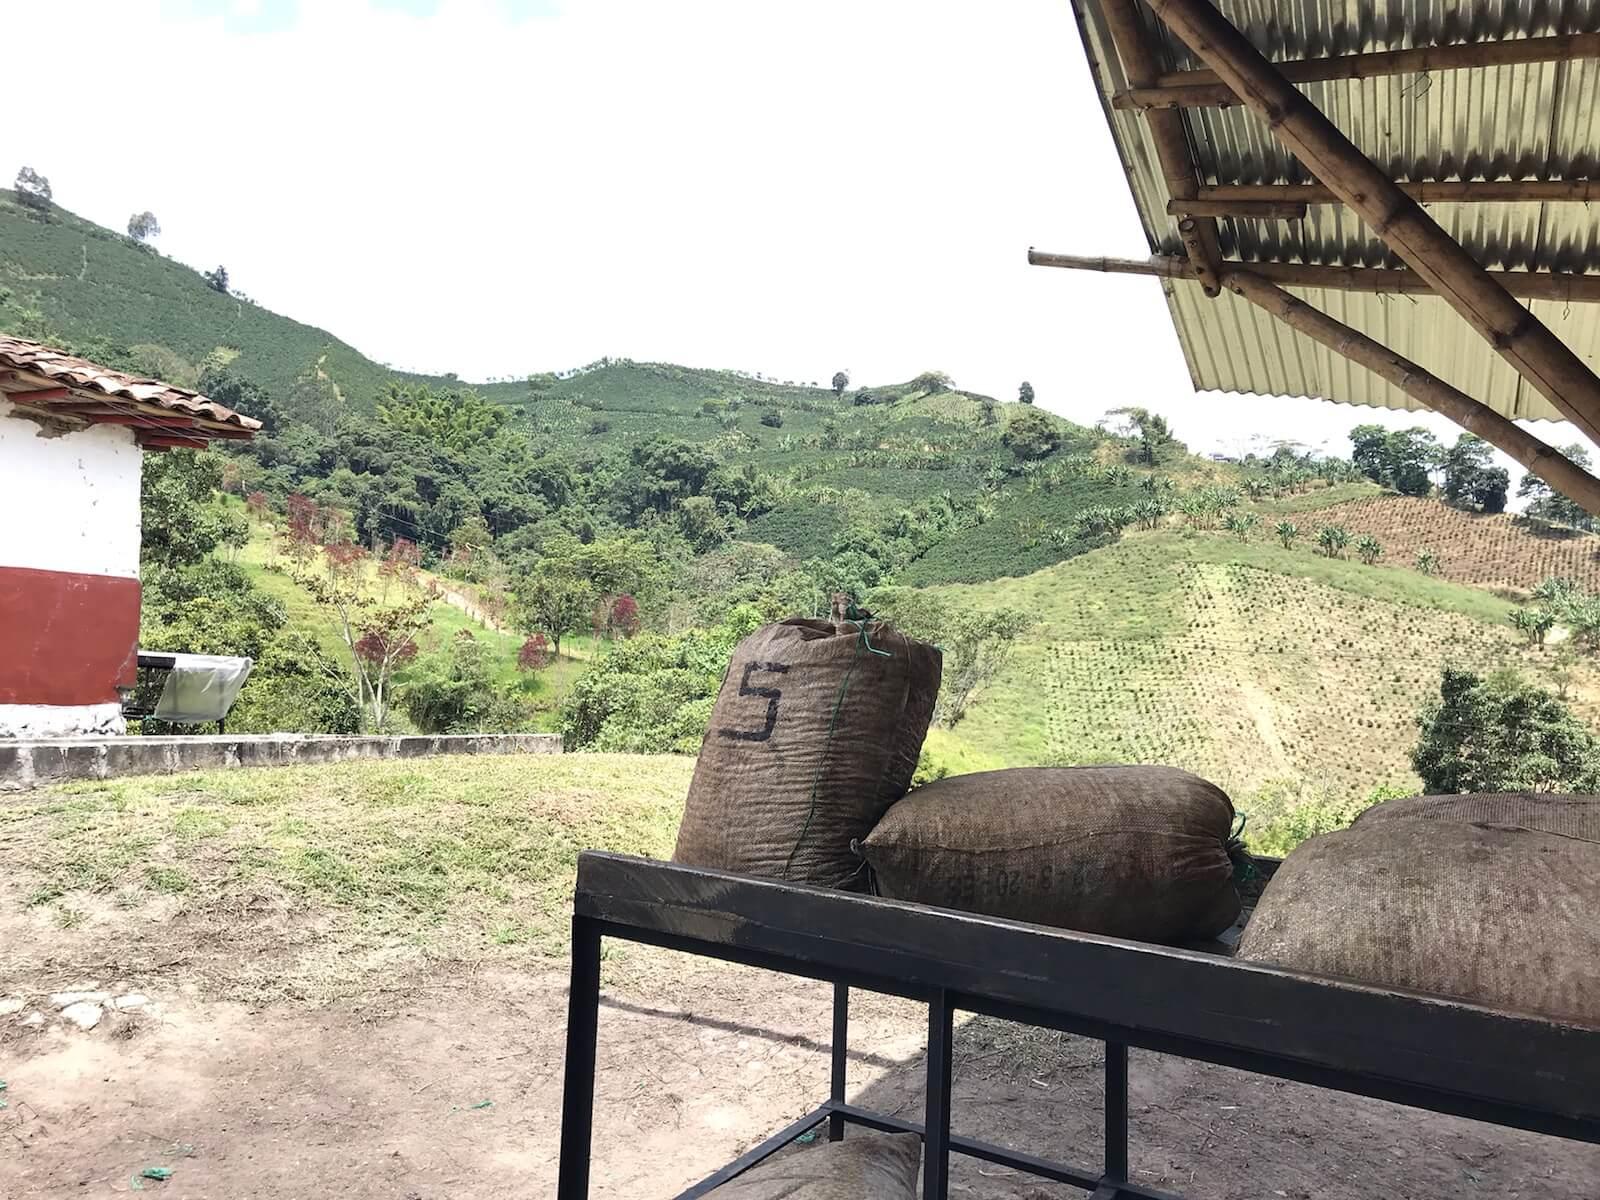 Finca Villa Ines from Purefi Coffee Roasters